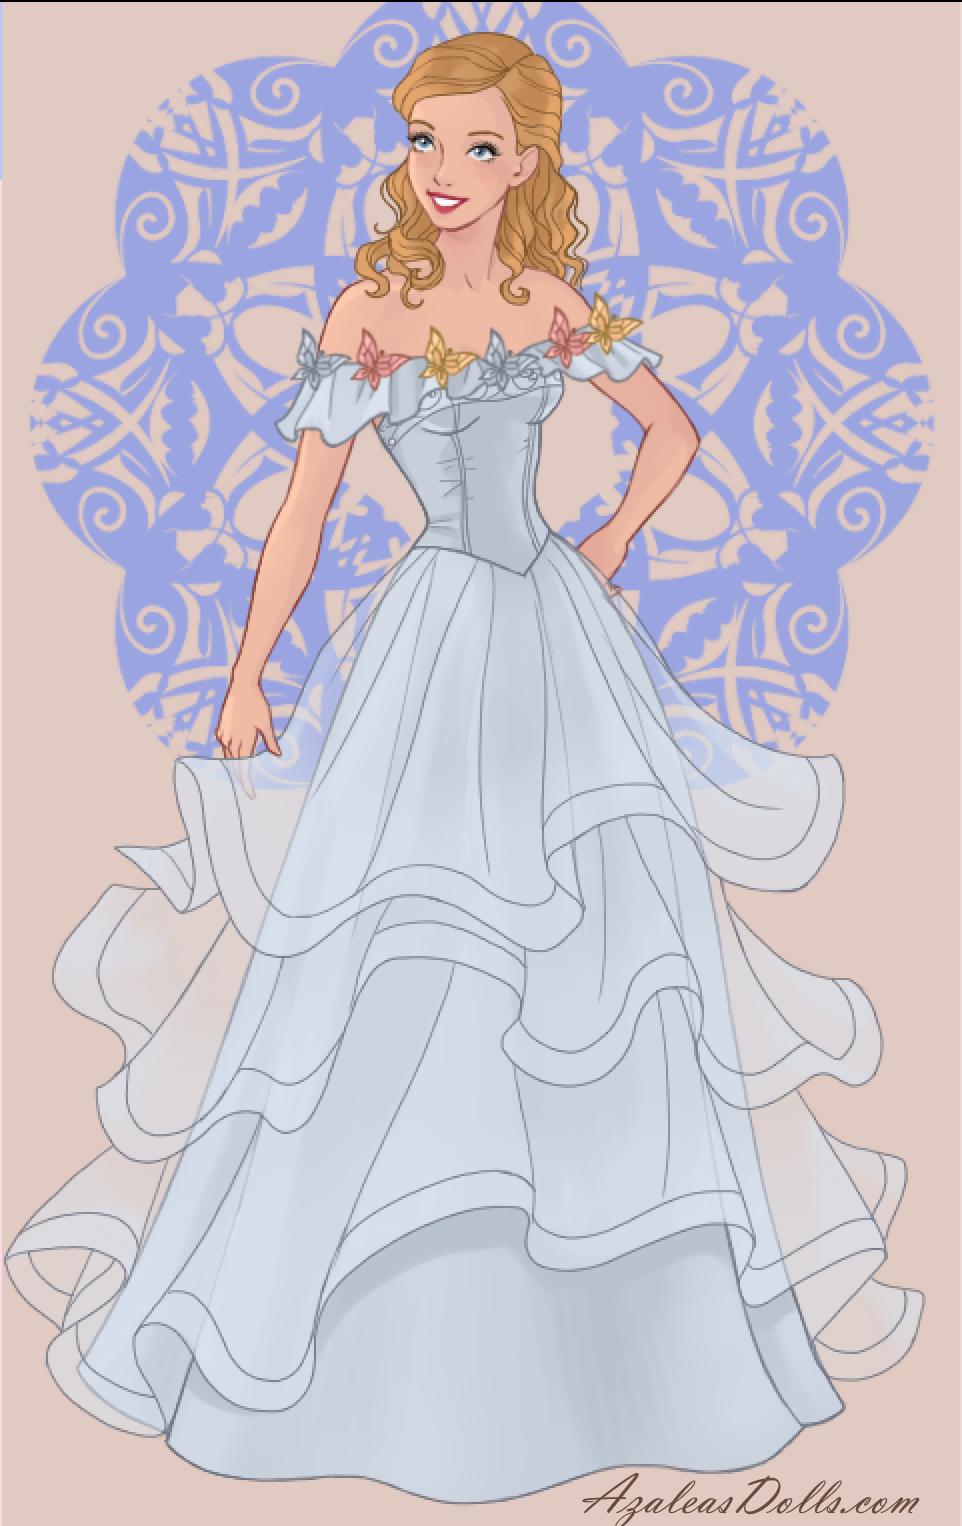 Wedding Dress Designers Game.Cinderella Live Action Version In Wedding Dress Design Dress Up Game